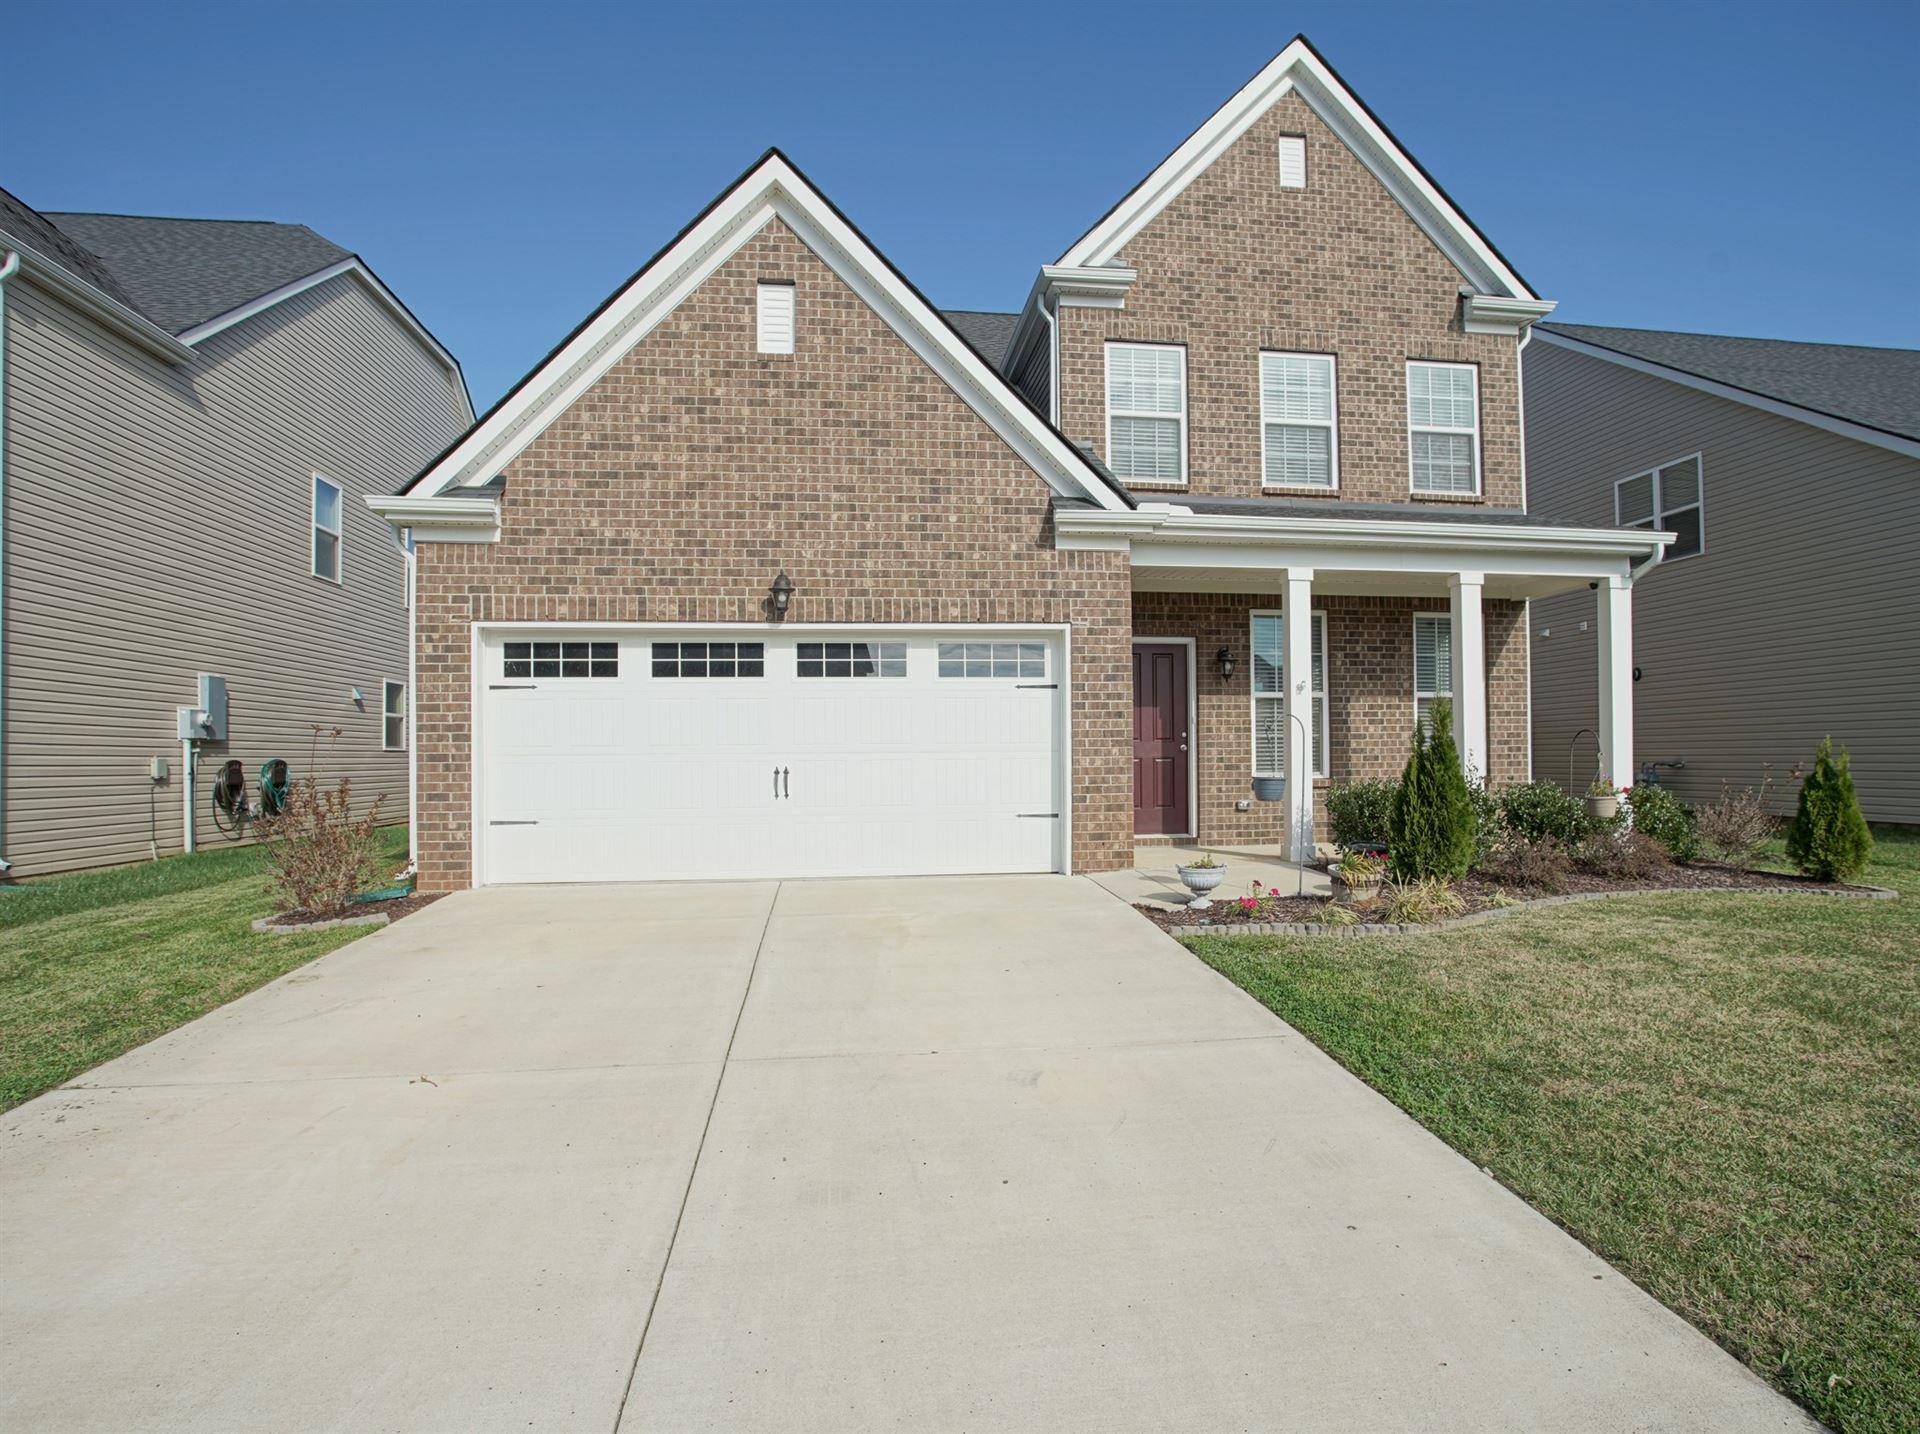 3214 Amaranth Ave, Murfreesboro, TN 37128 - MLS#: 2211208